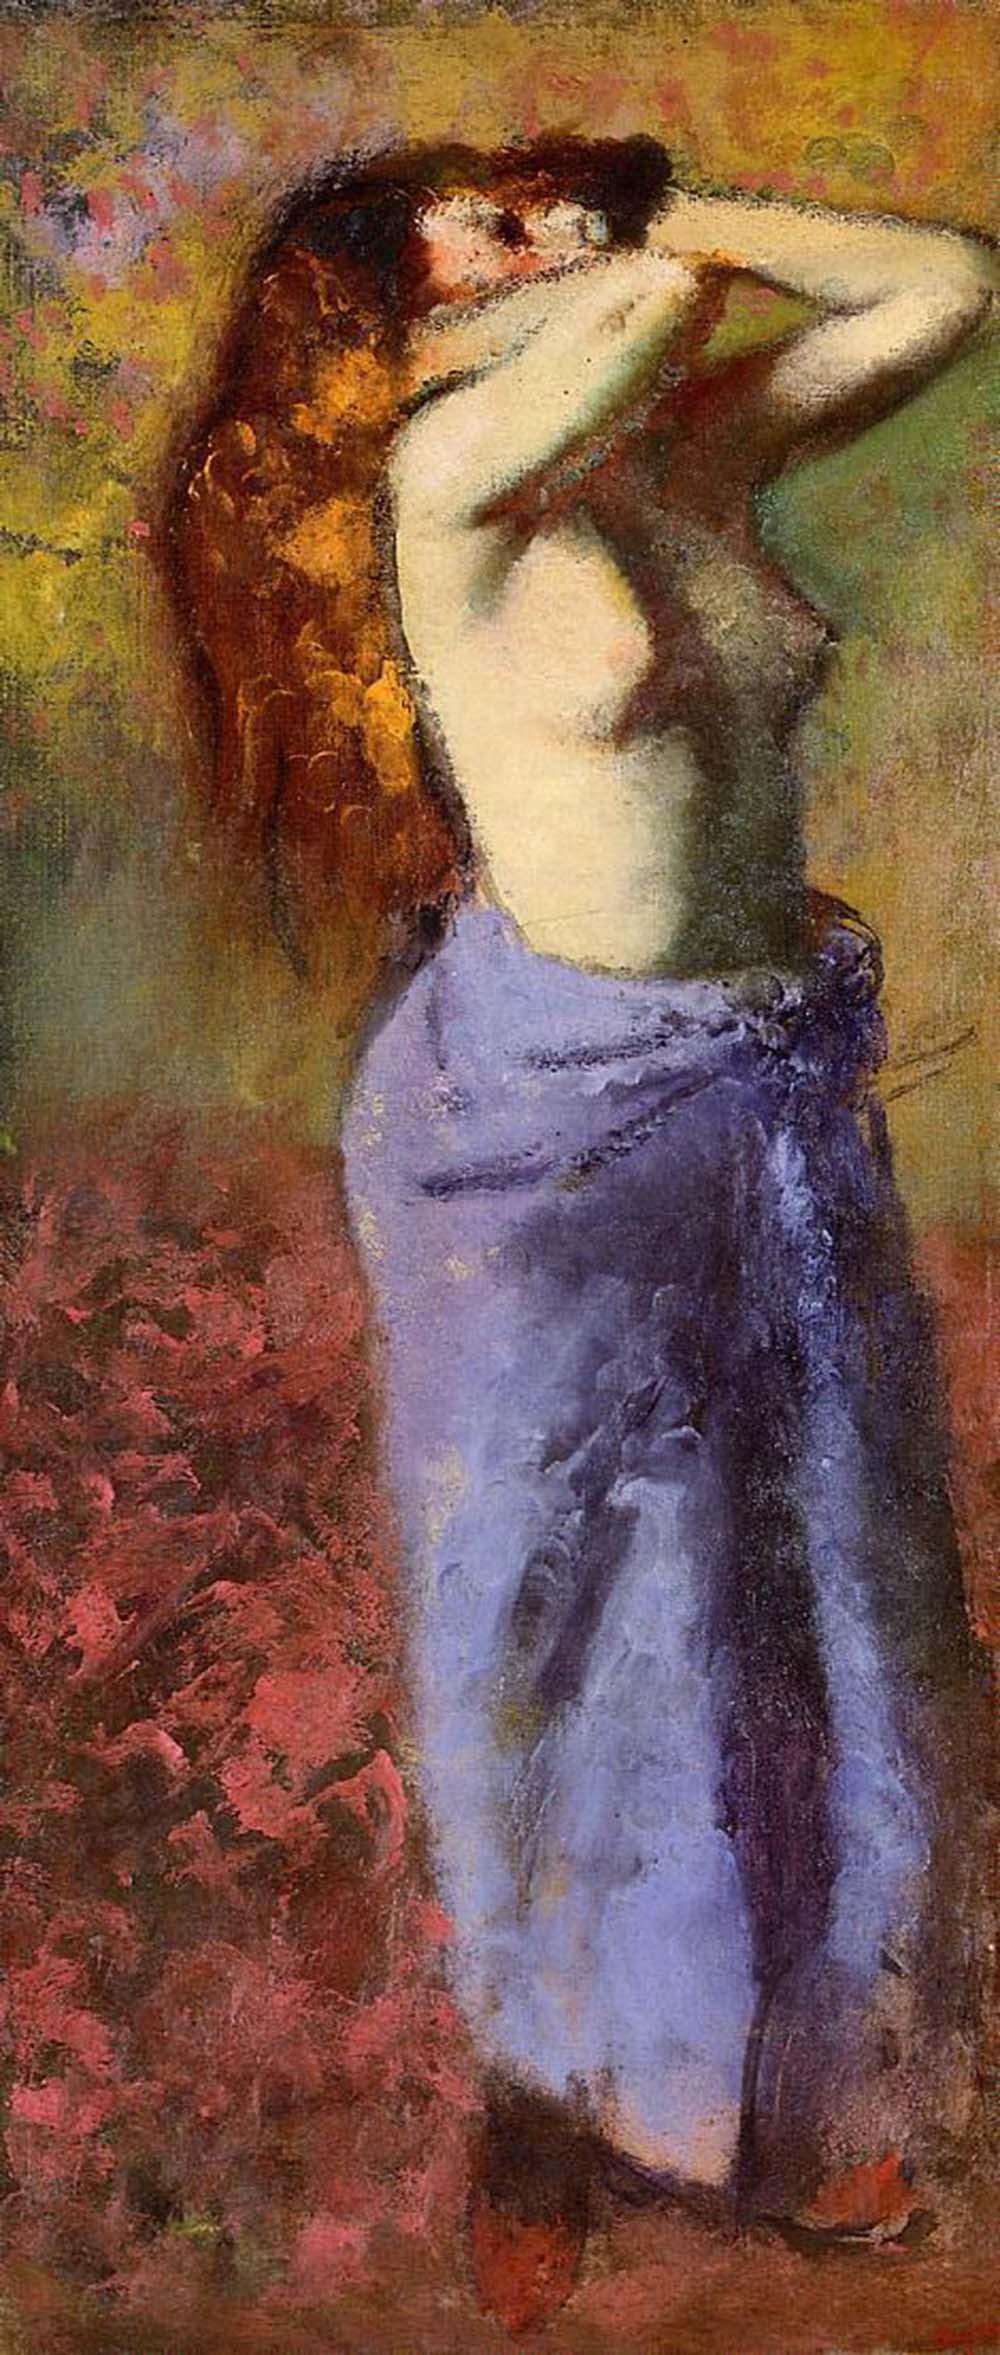 Edgar Degas. Nude woman in a blue robe